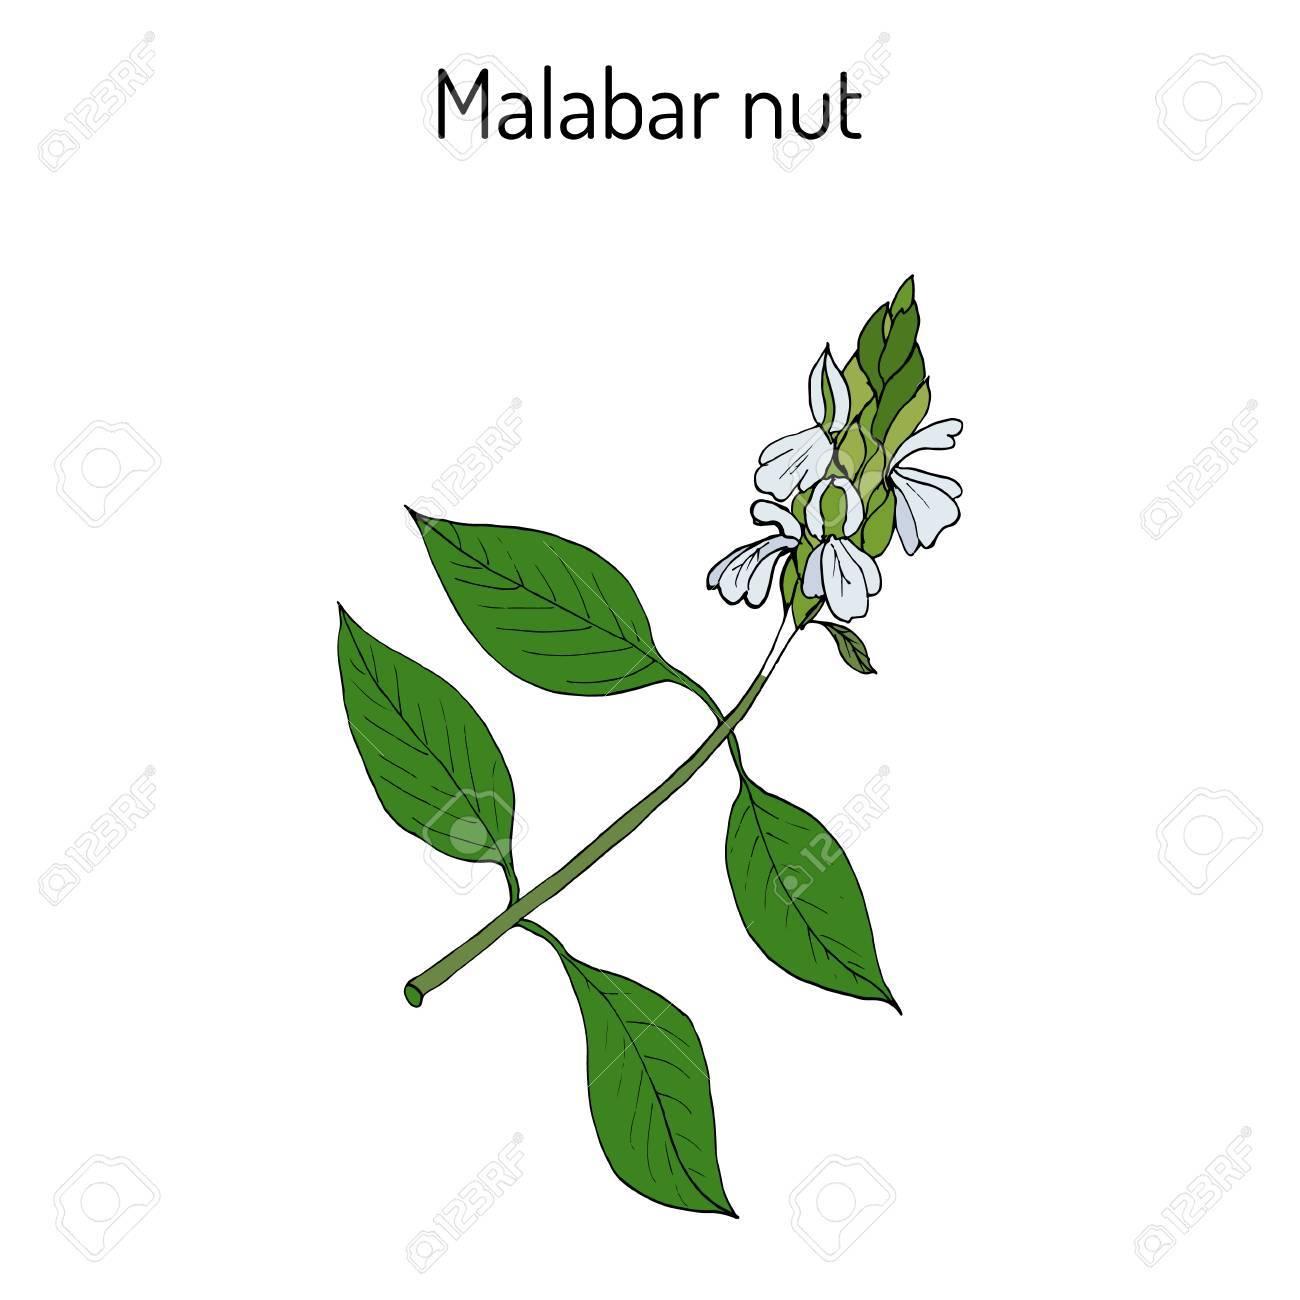 Malabar nut Justicia adhatoda , or adulsa, adhatoda, vasa, or